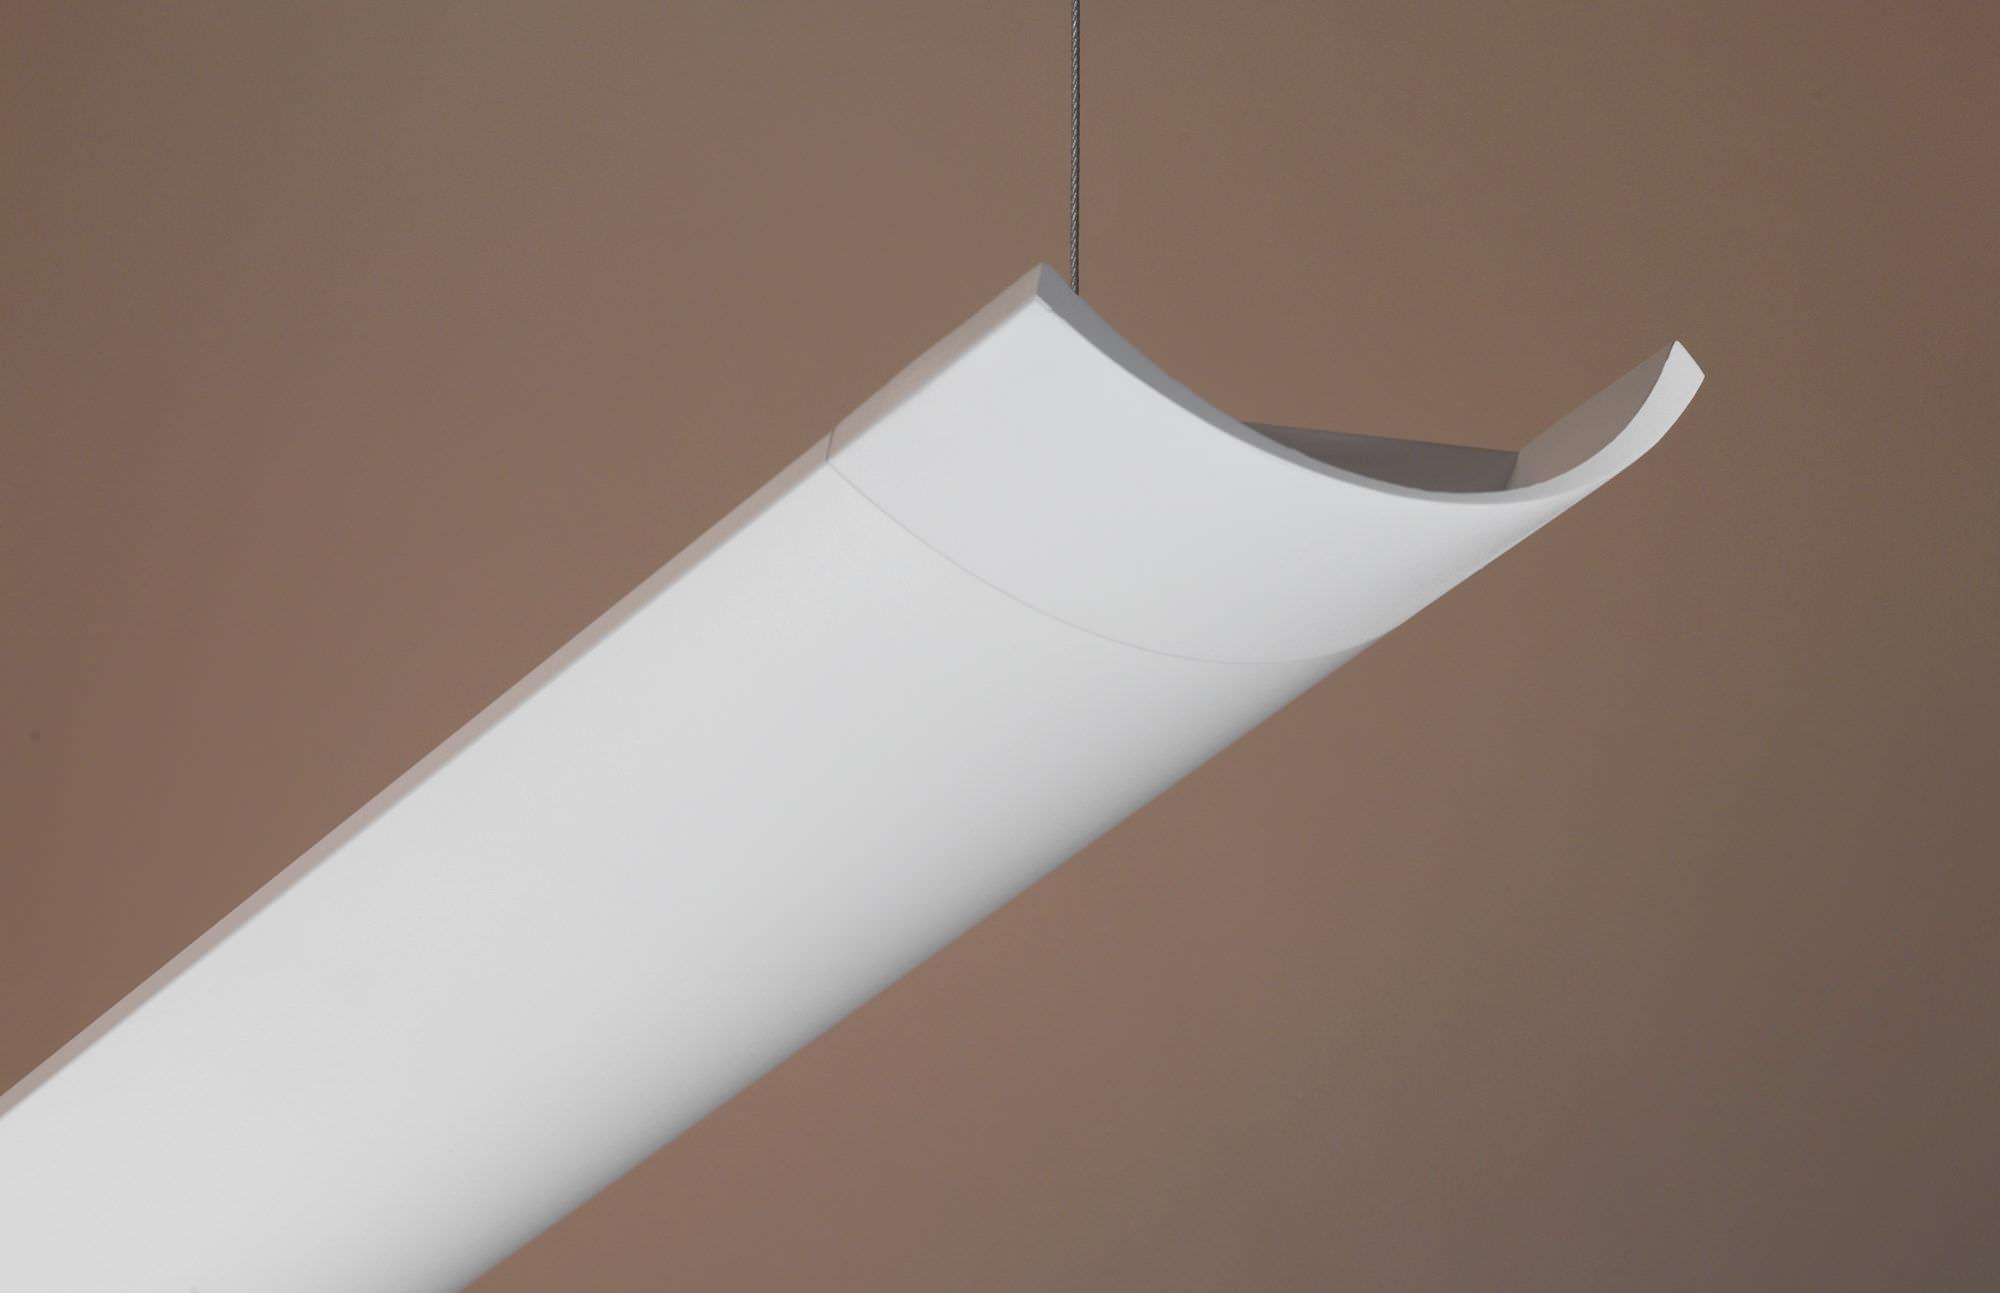 Suspension Luminaire Luminaire Indirect Indirect Indirect Luminaire Suspension Suspension Luminaire xhdtQrsC